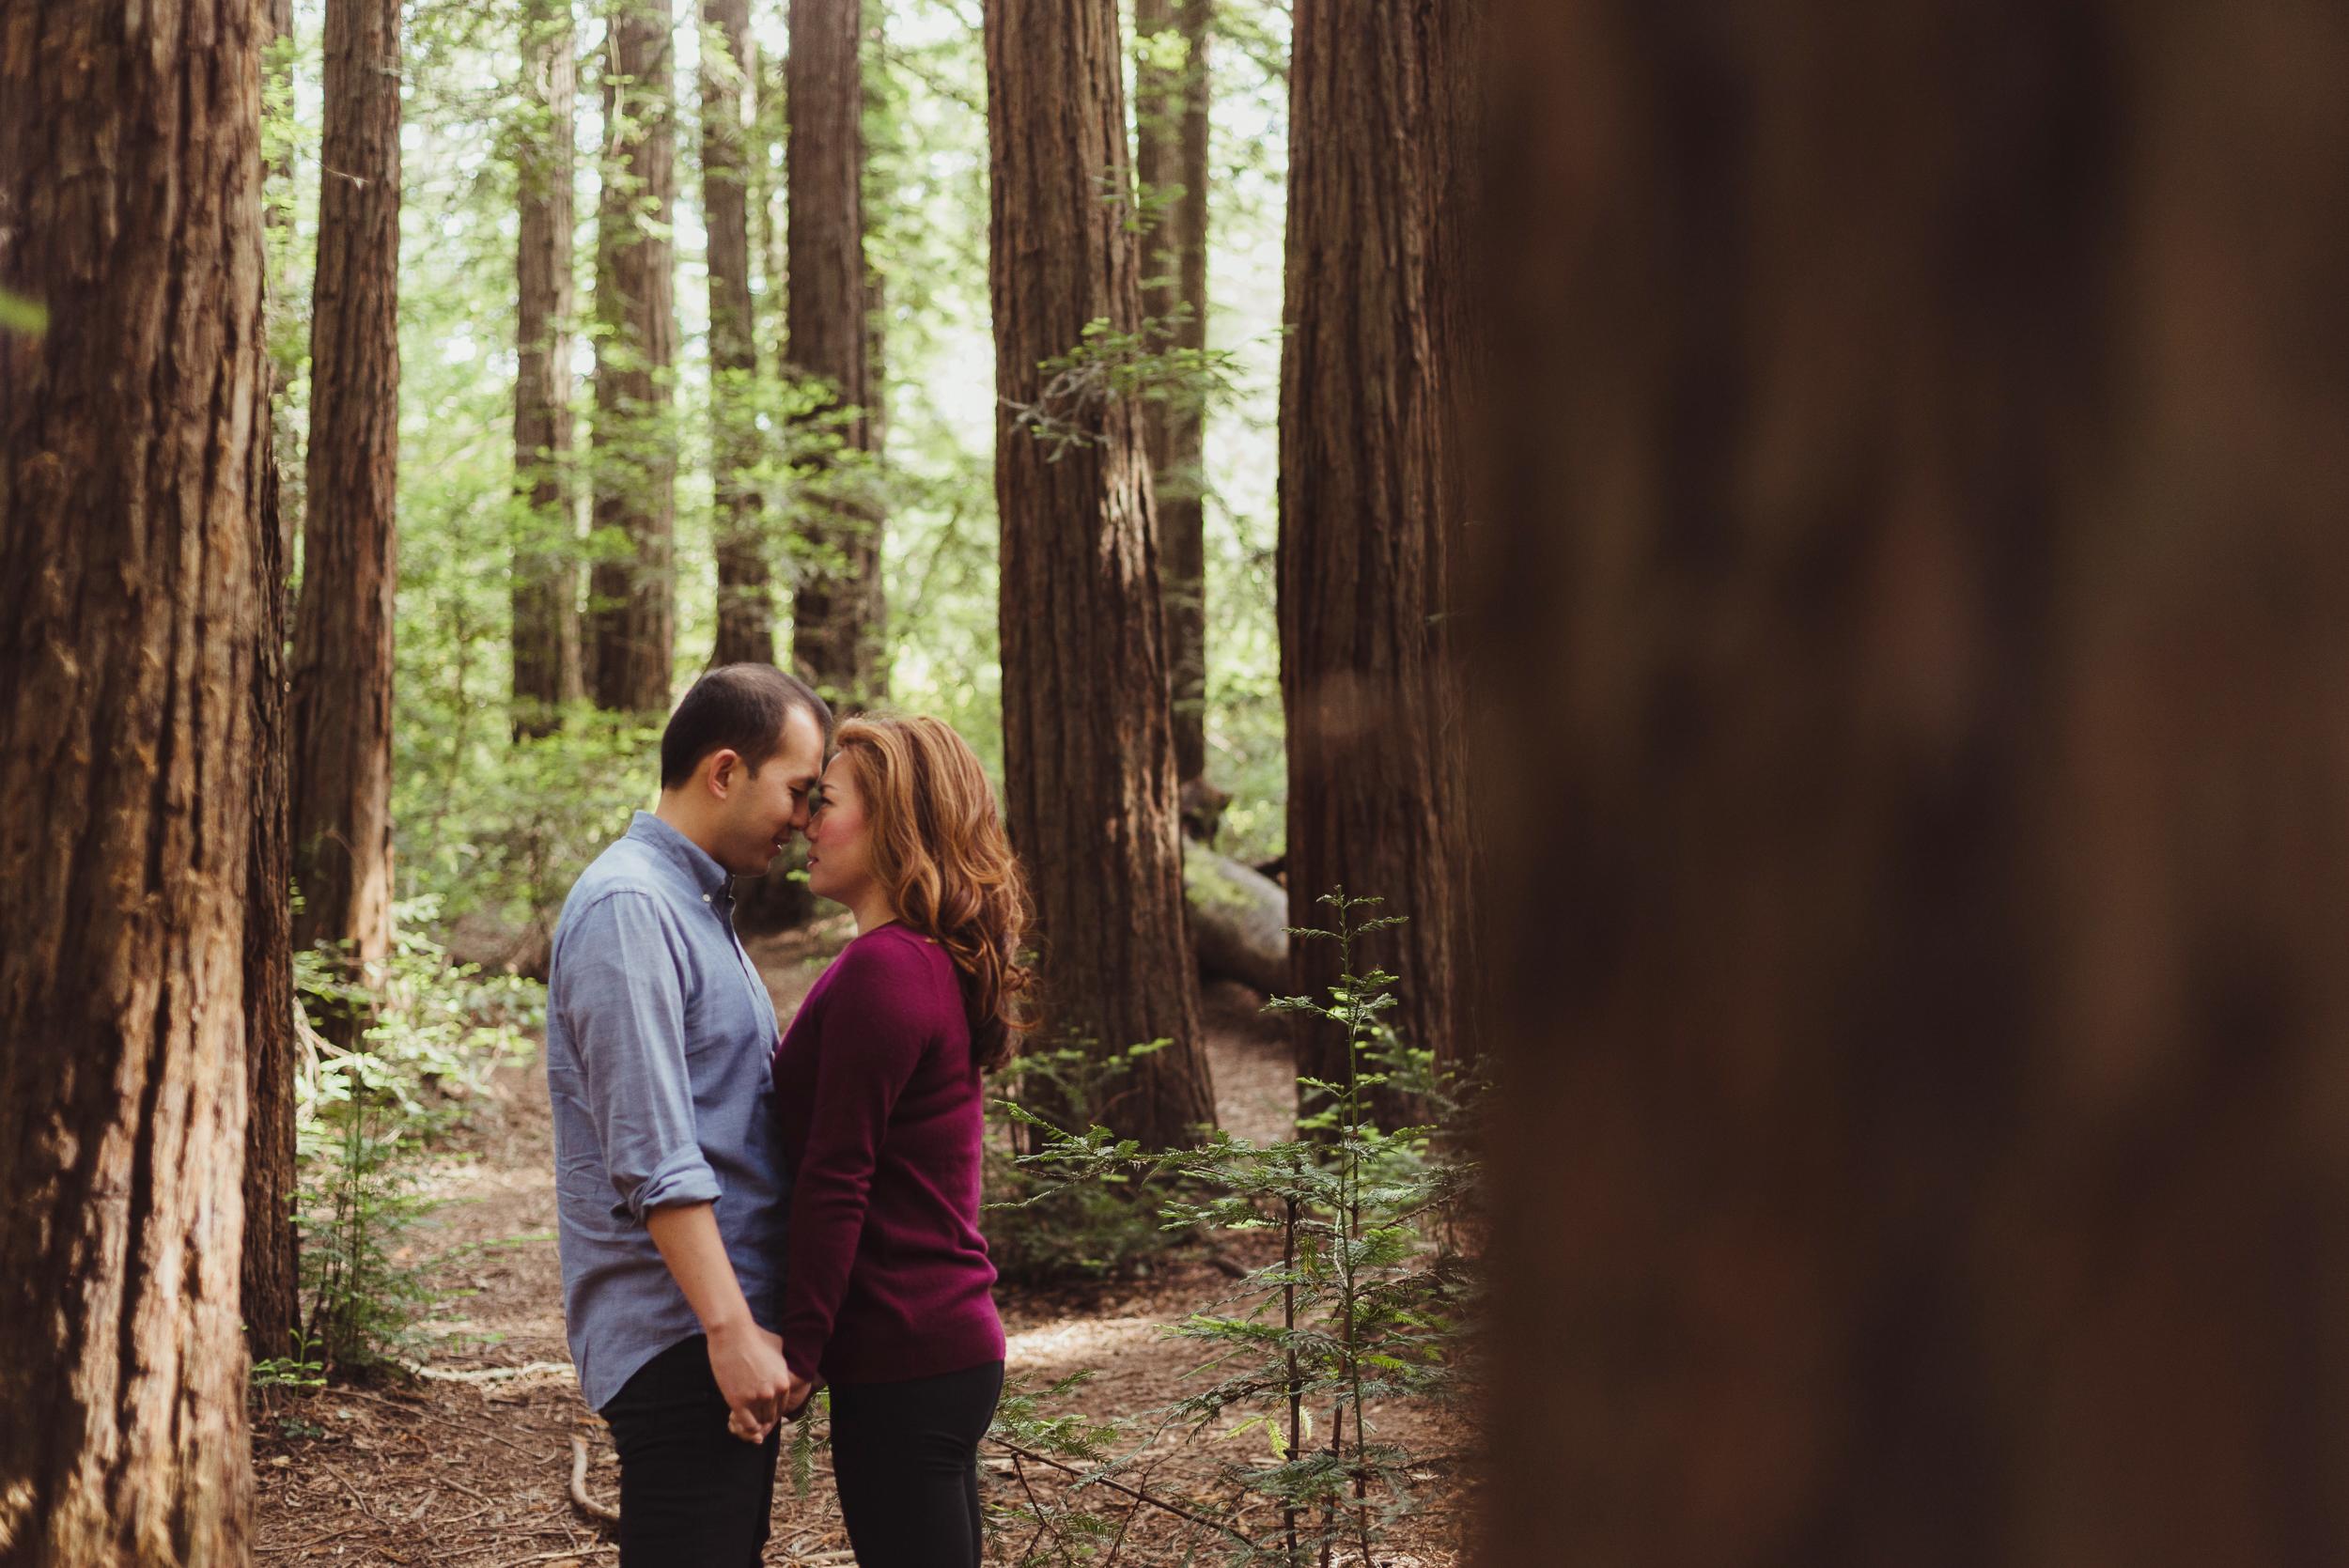 redwood-regional-park-oakland-engagement-vivianchen-026.jpg